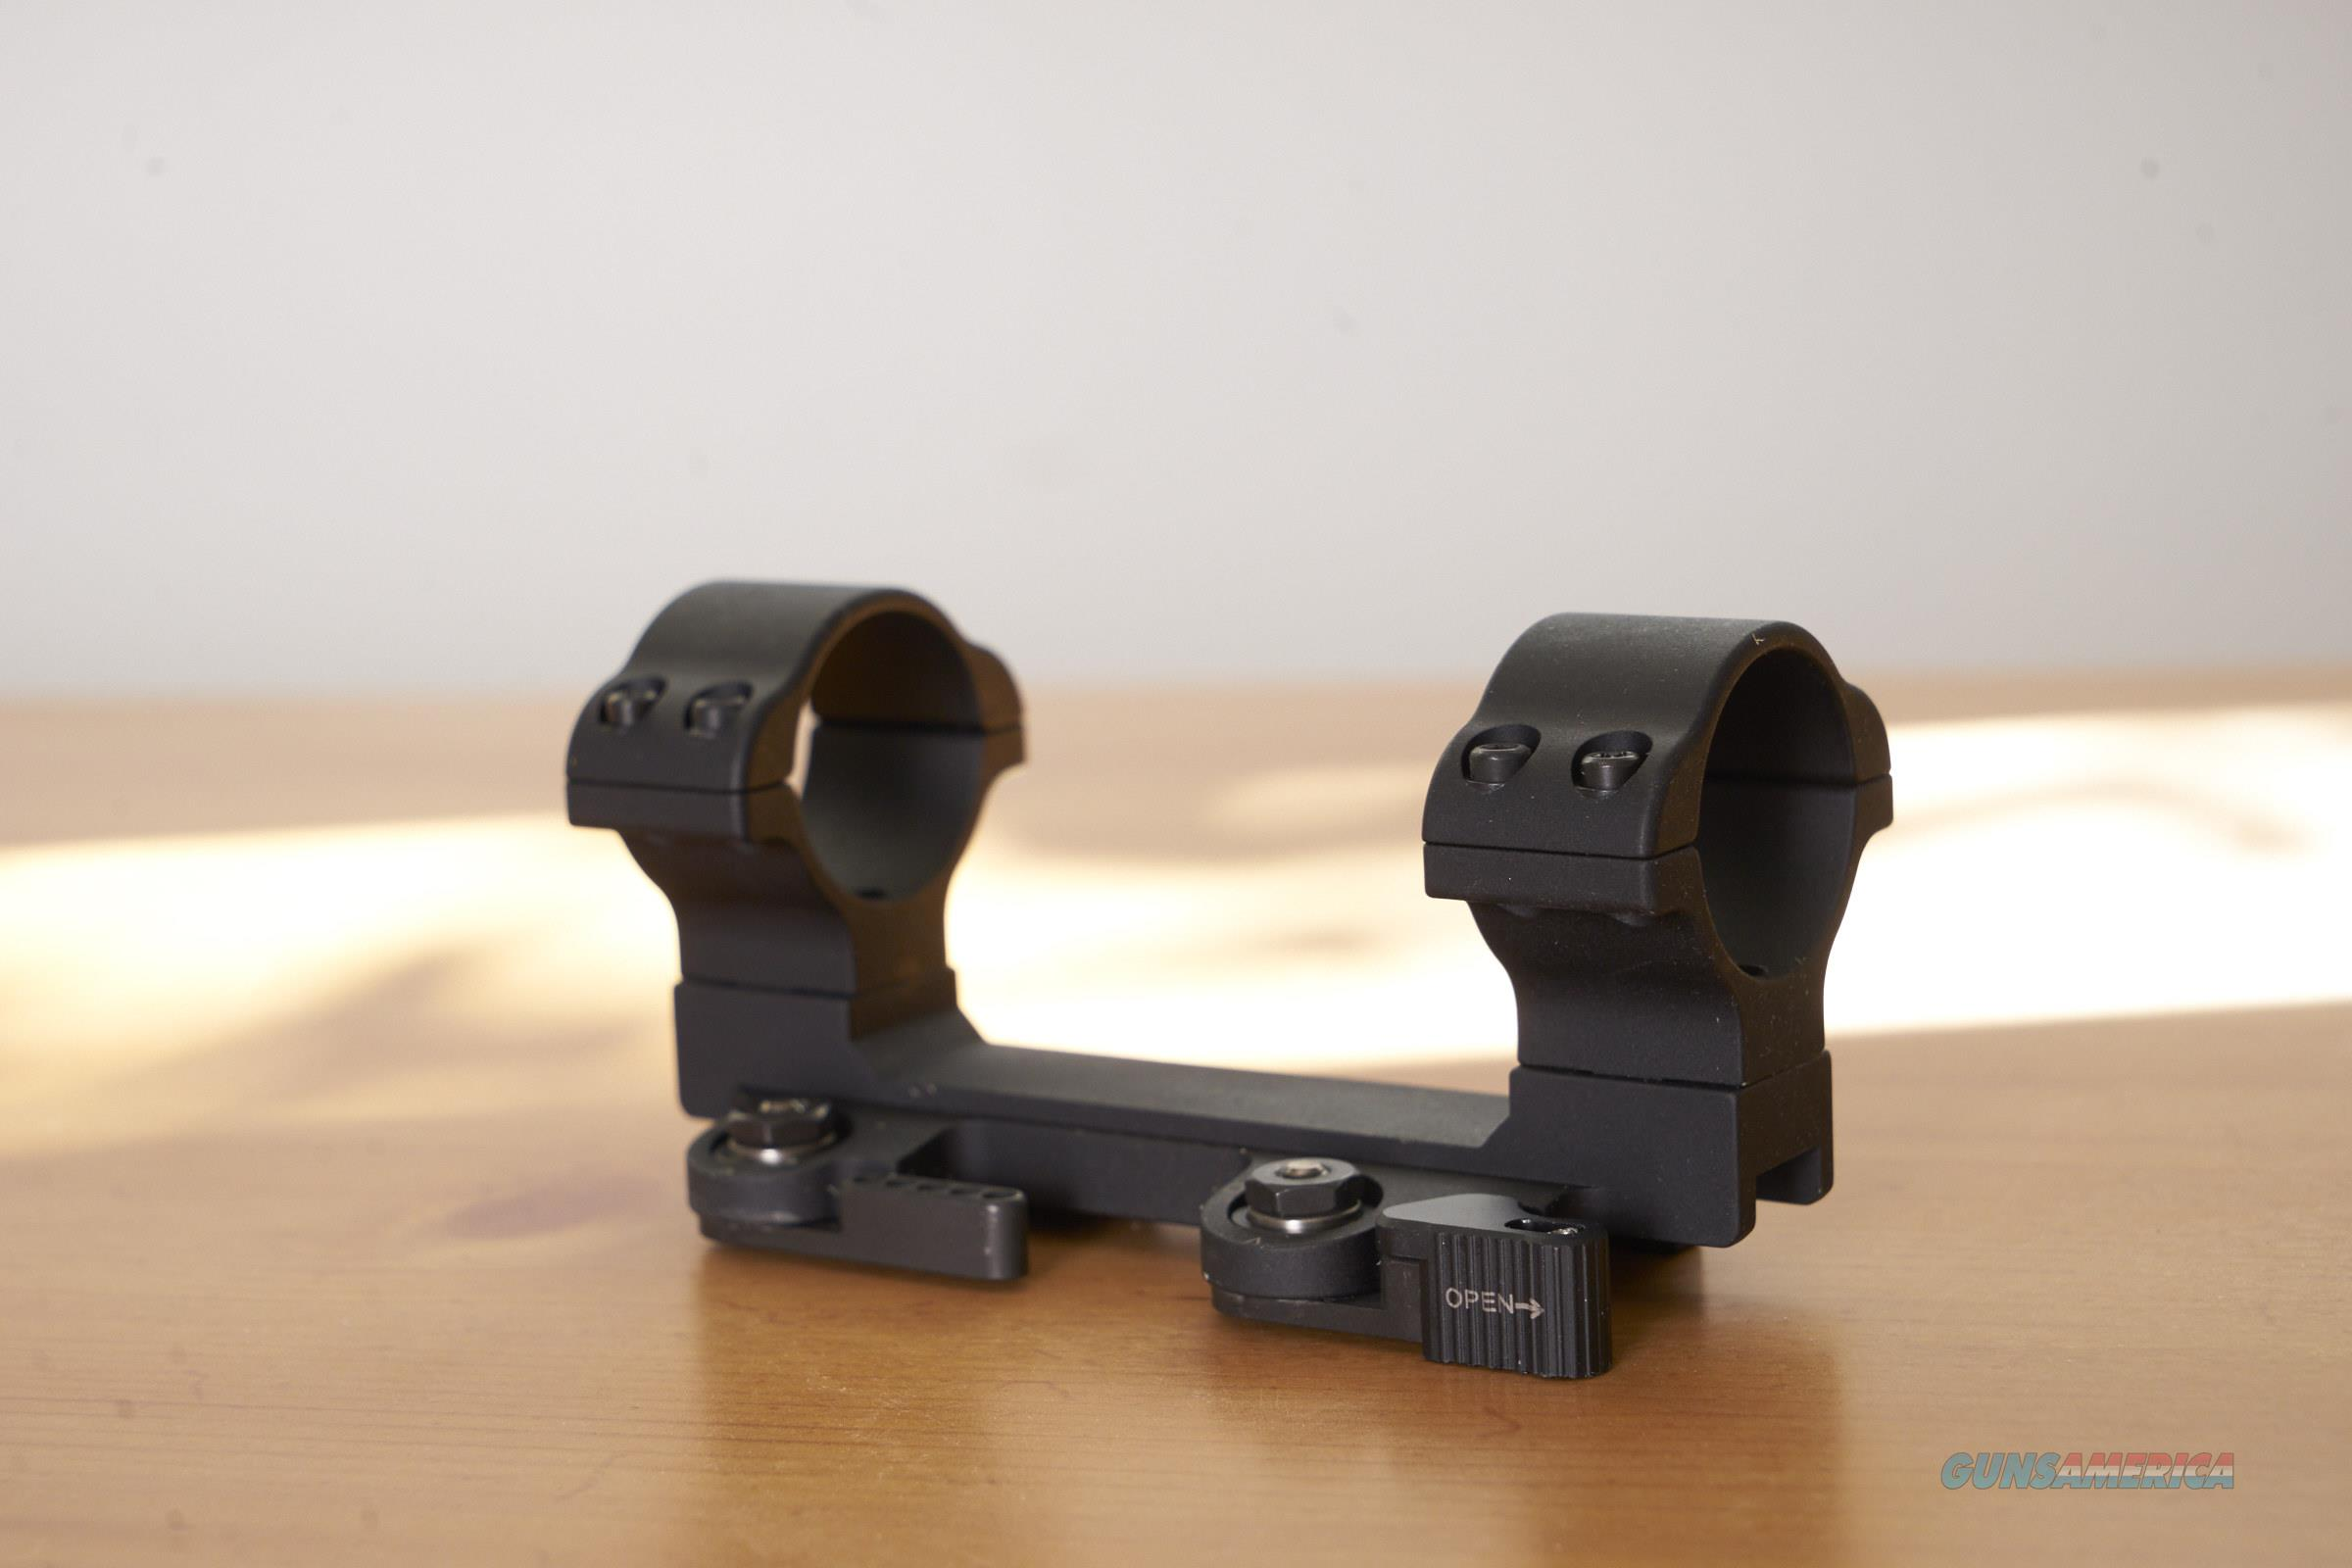 LaRue Tactical Quick Detach 30mm mount  Non-Guns > Scopes/Mounts/Rings & Optics > Mounts > Tactical Rail Mounted